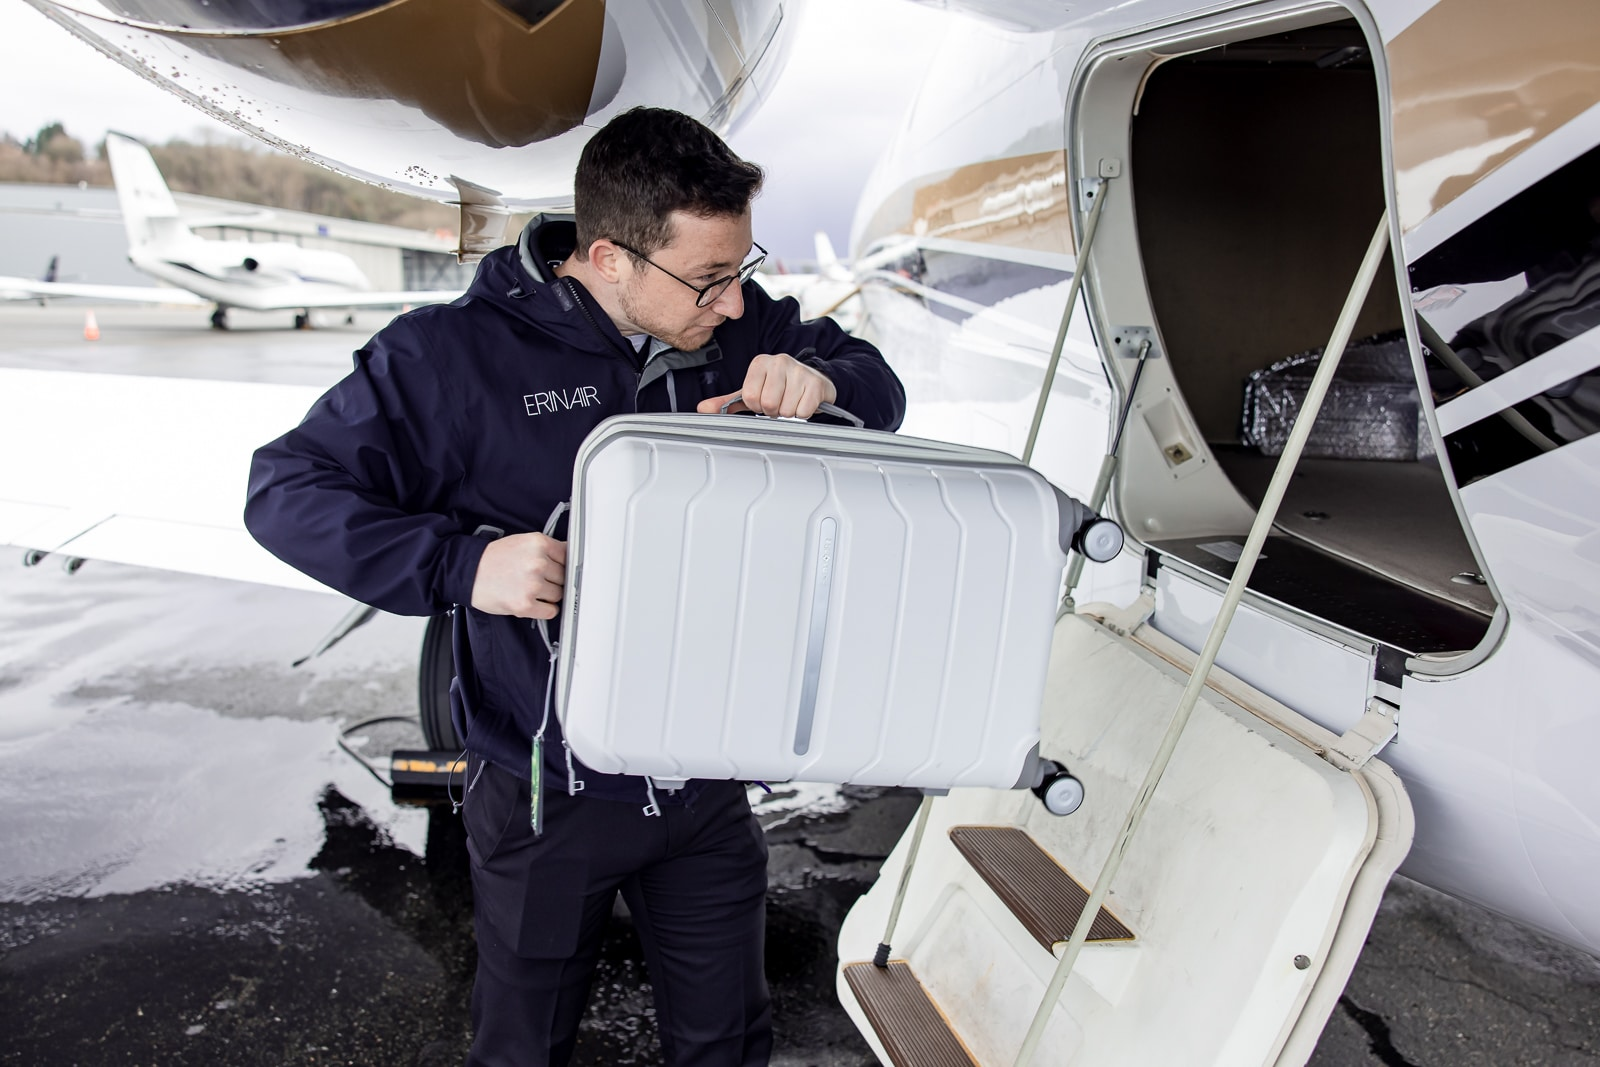 Erin Air Luggage